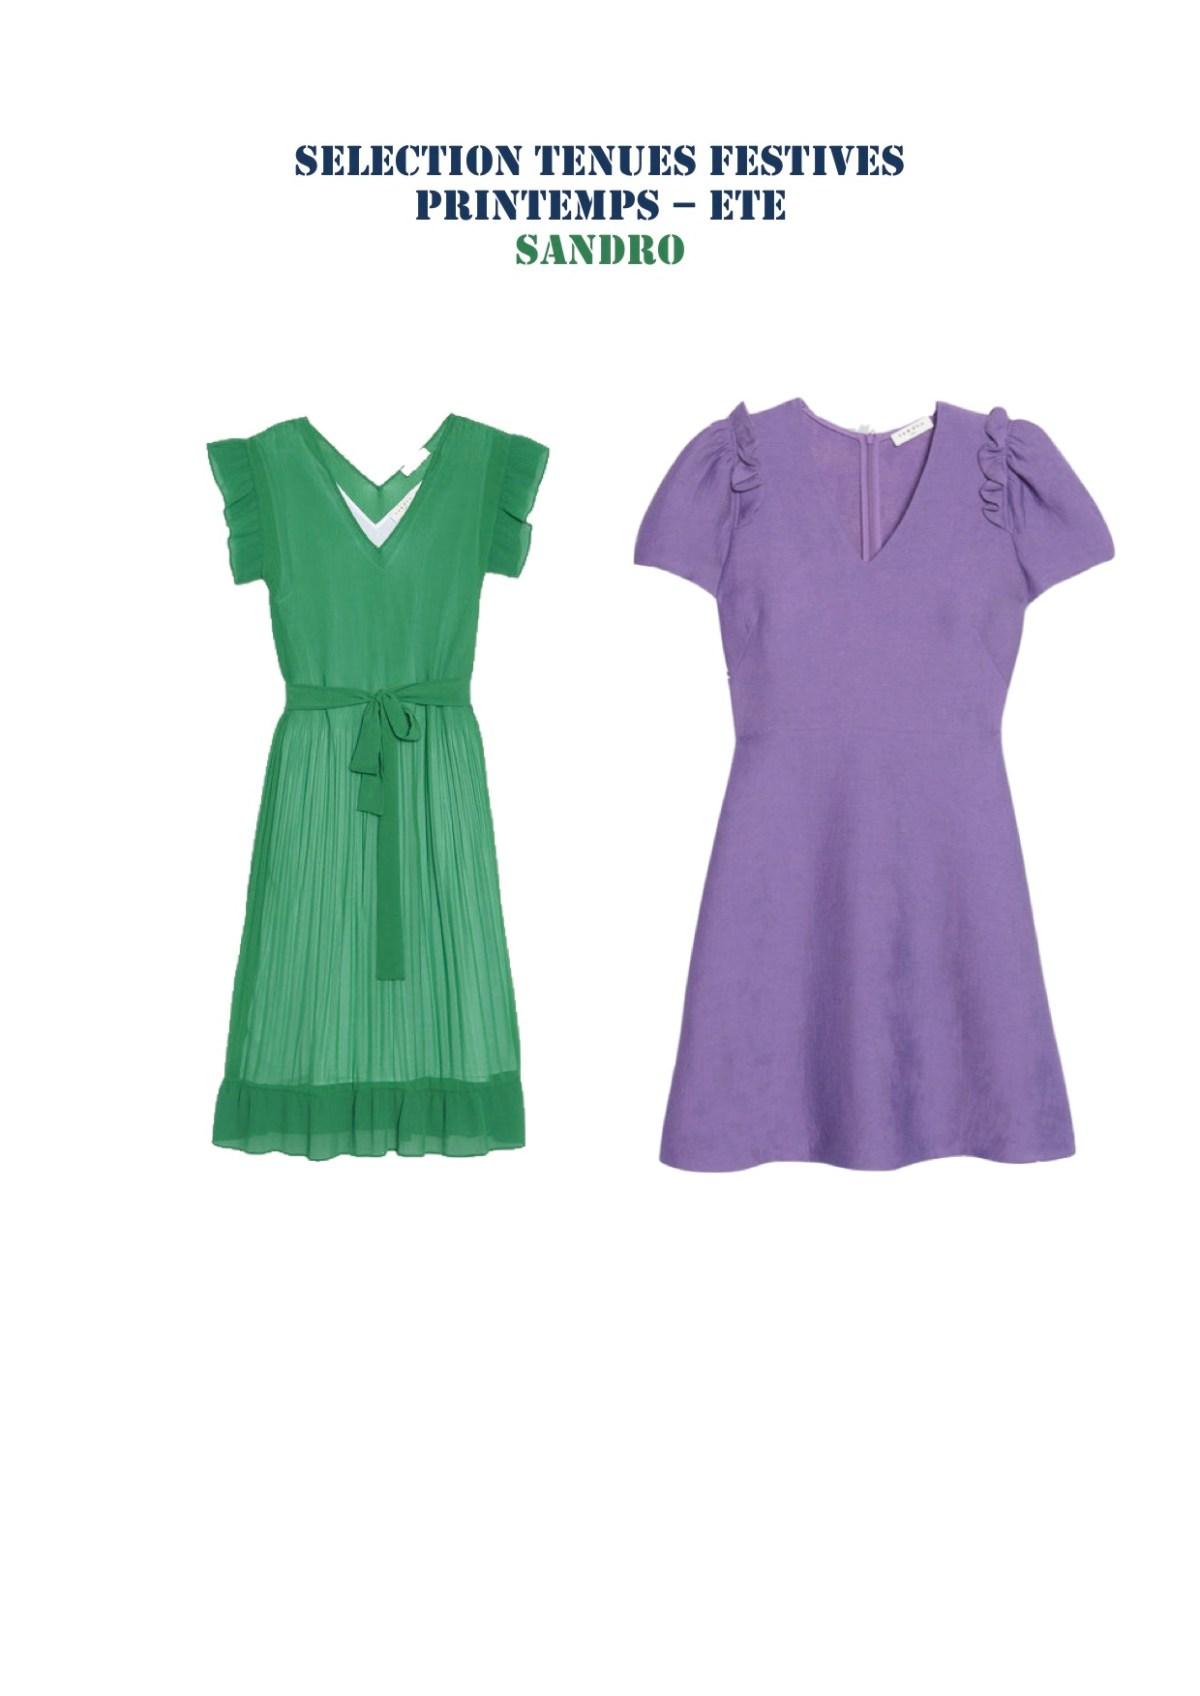 robe mariage esprit blog suisse maman thereseandthekids sandro